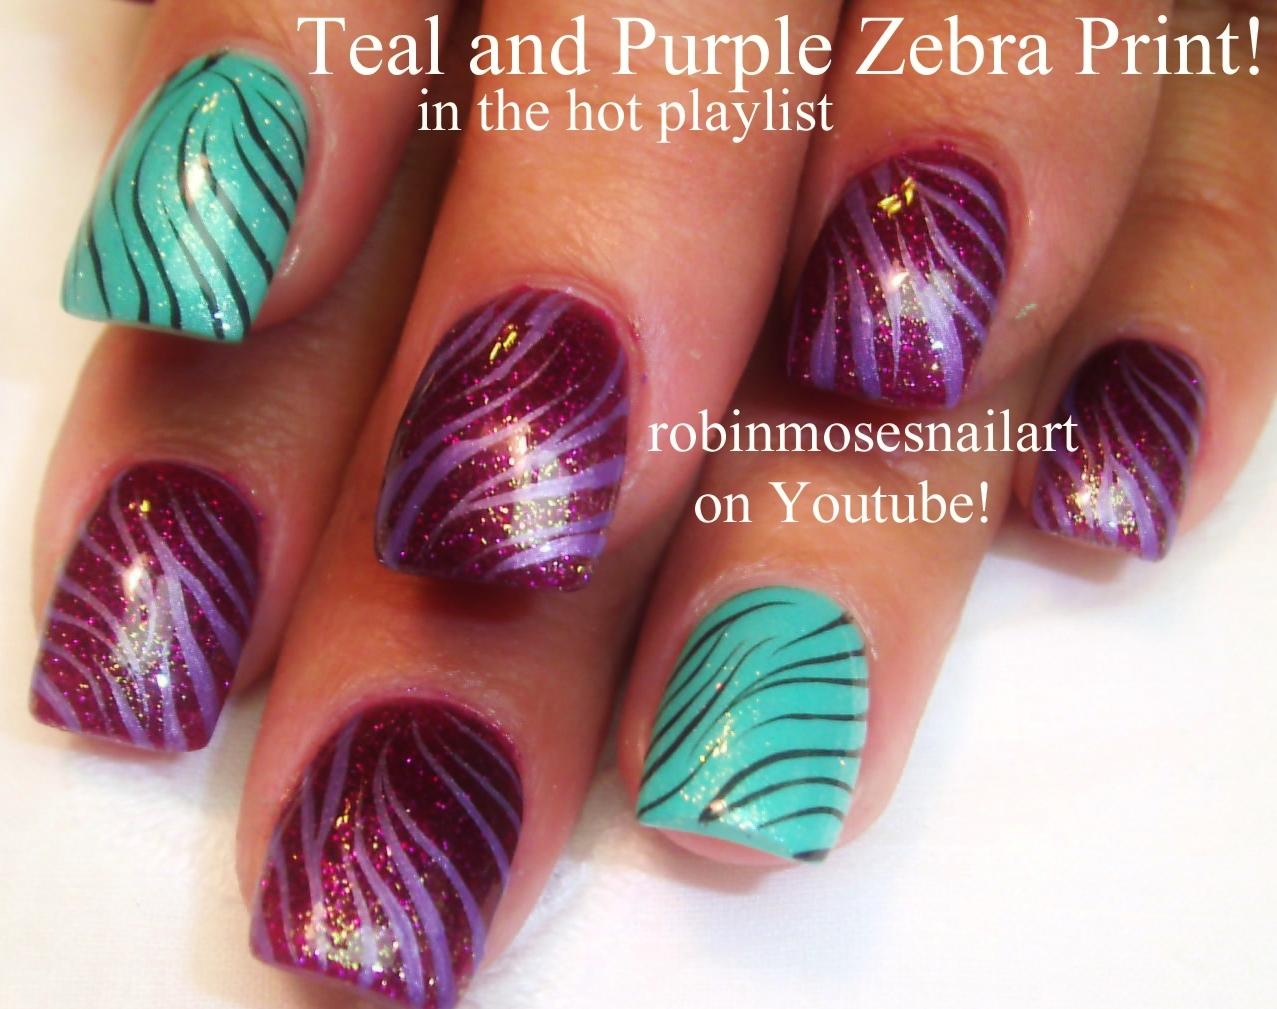 Pink and purple animal print see thru tights 3